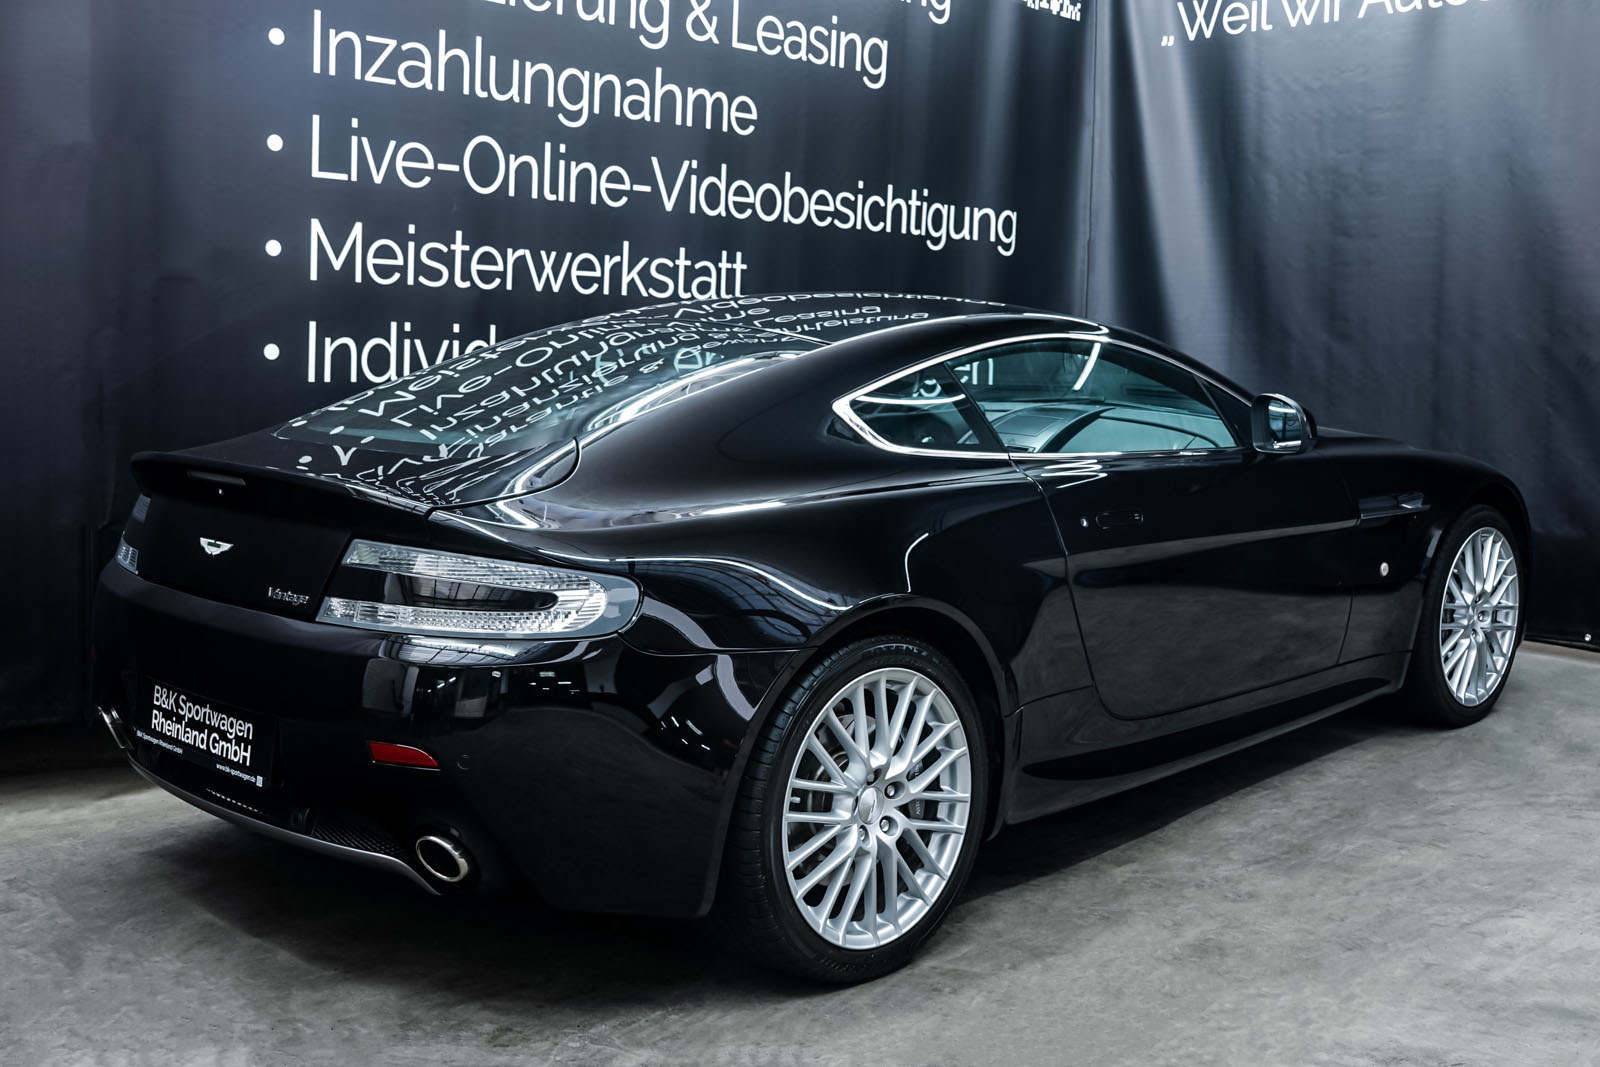 AstonMartin_V8_Vantage_Schwarz_Schwarz_AM-5679_13_w